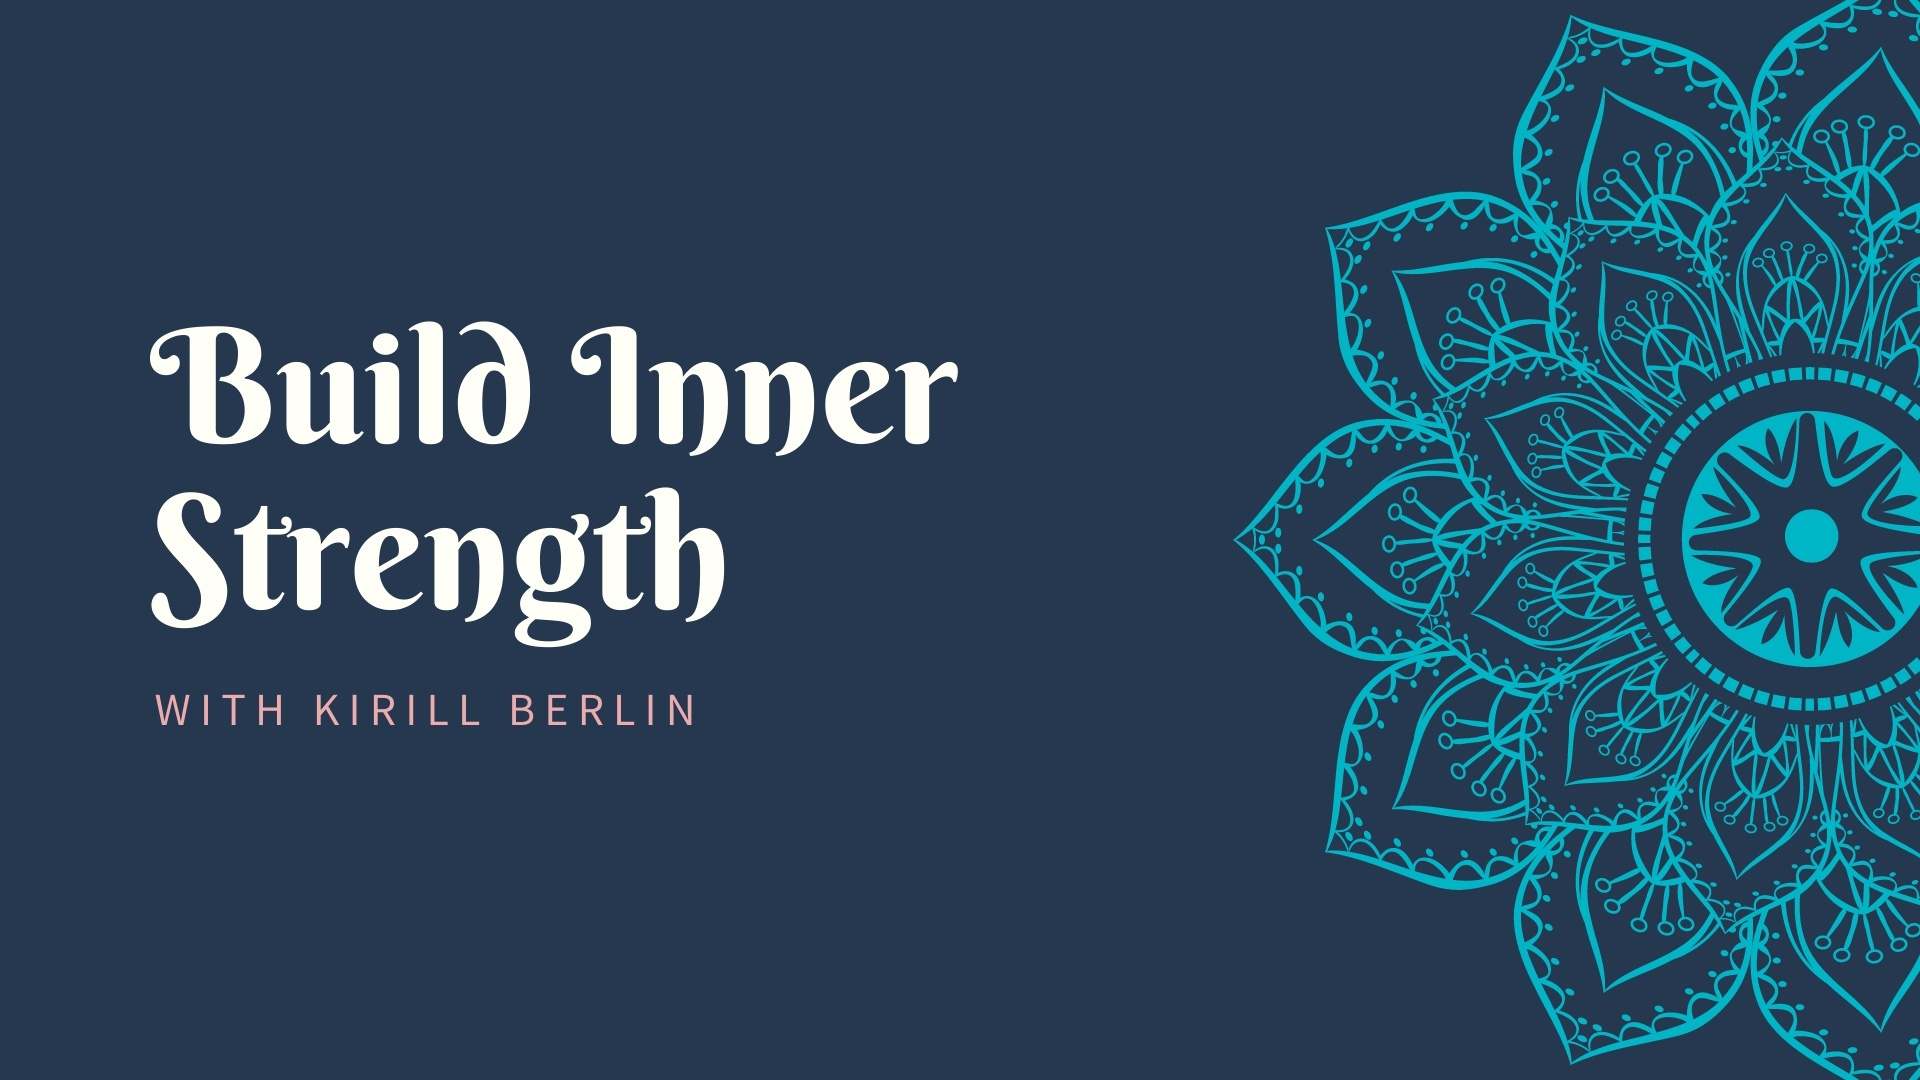 Build Inner Strength with Kirill Berlin